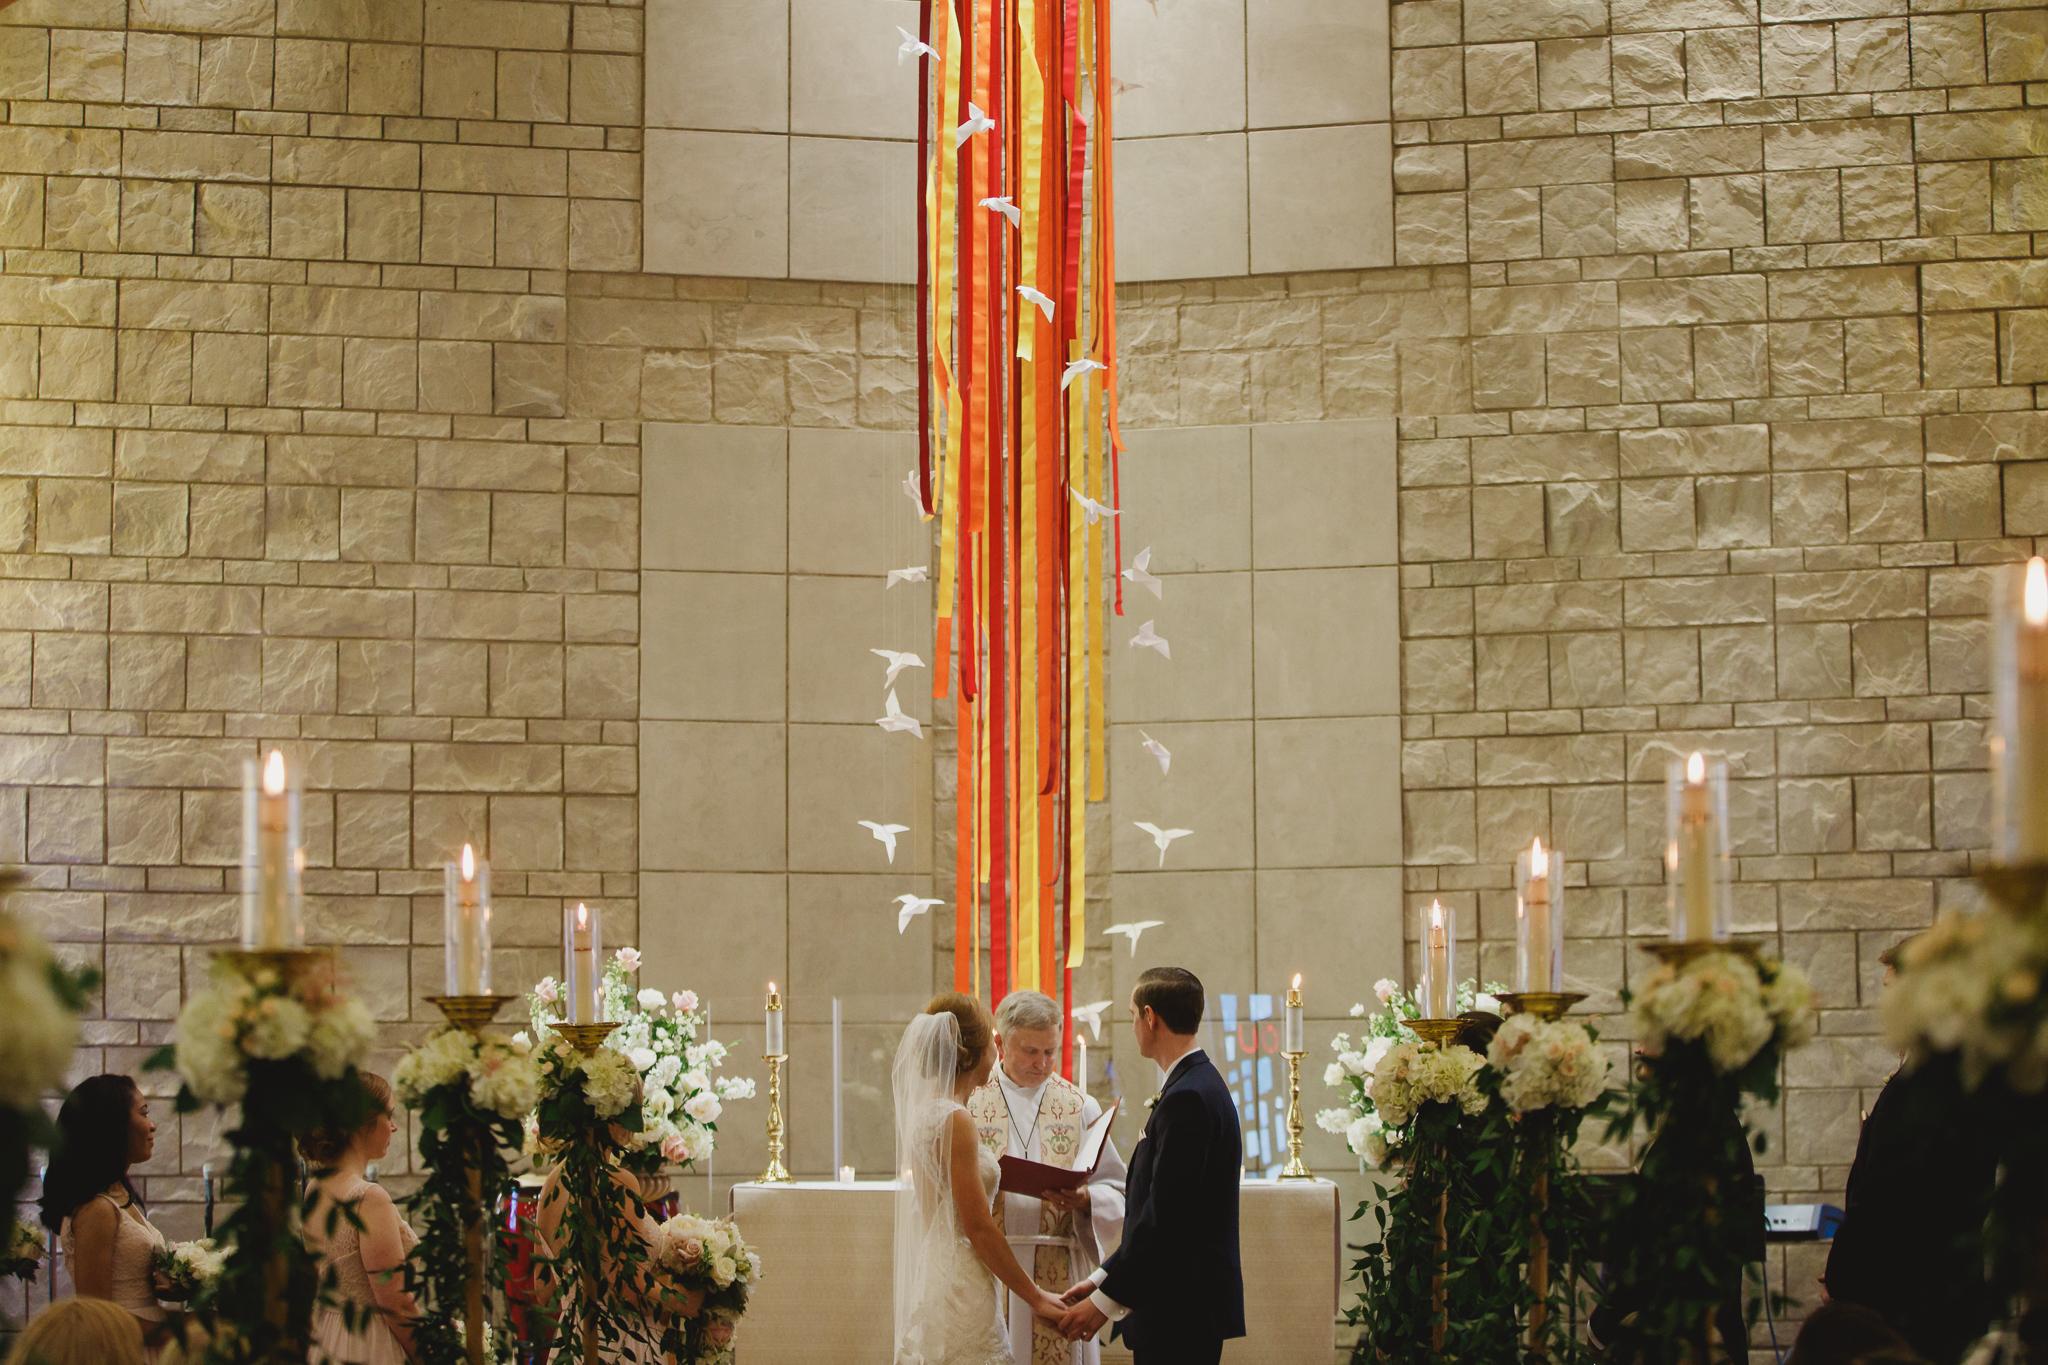 Michael and Kelly - the ashton depot - wedding DFW - wedding photographer- elizalde photography (43 of 150).jpg